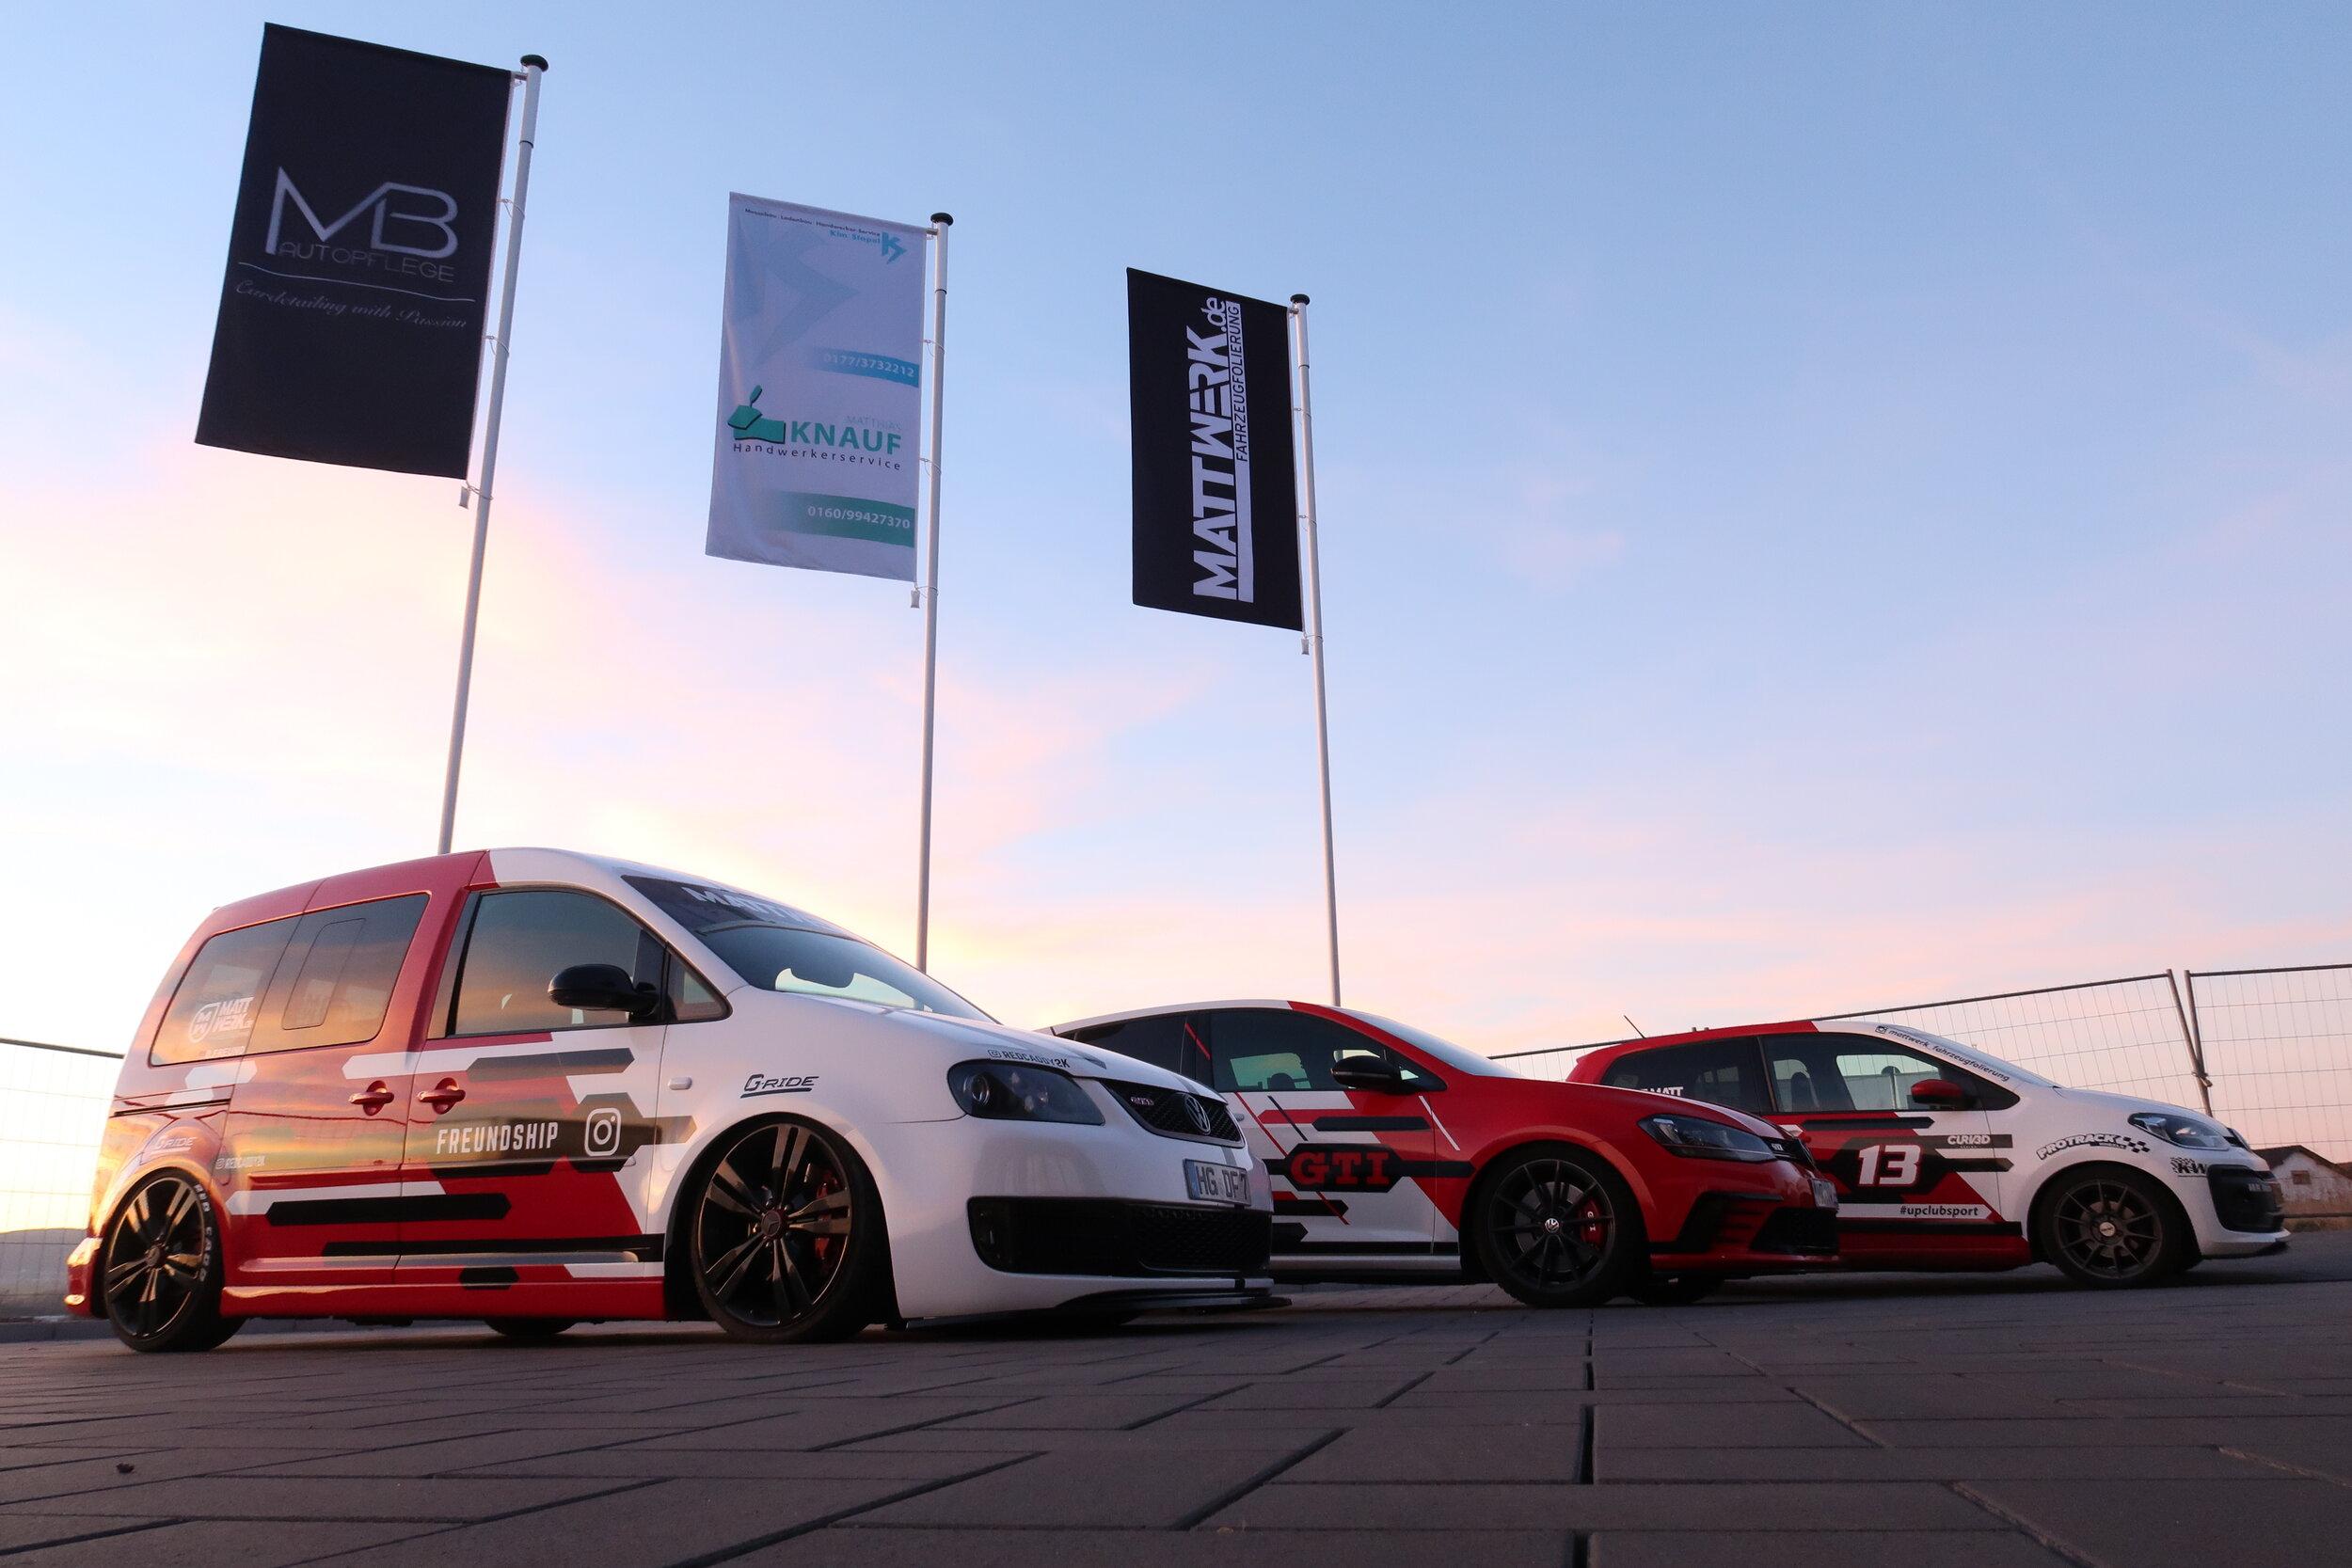 VW TCR Design - Auf VW Caddy, VW Golf und VW UP